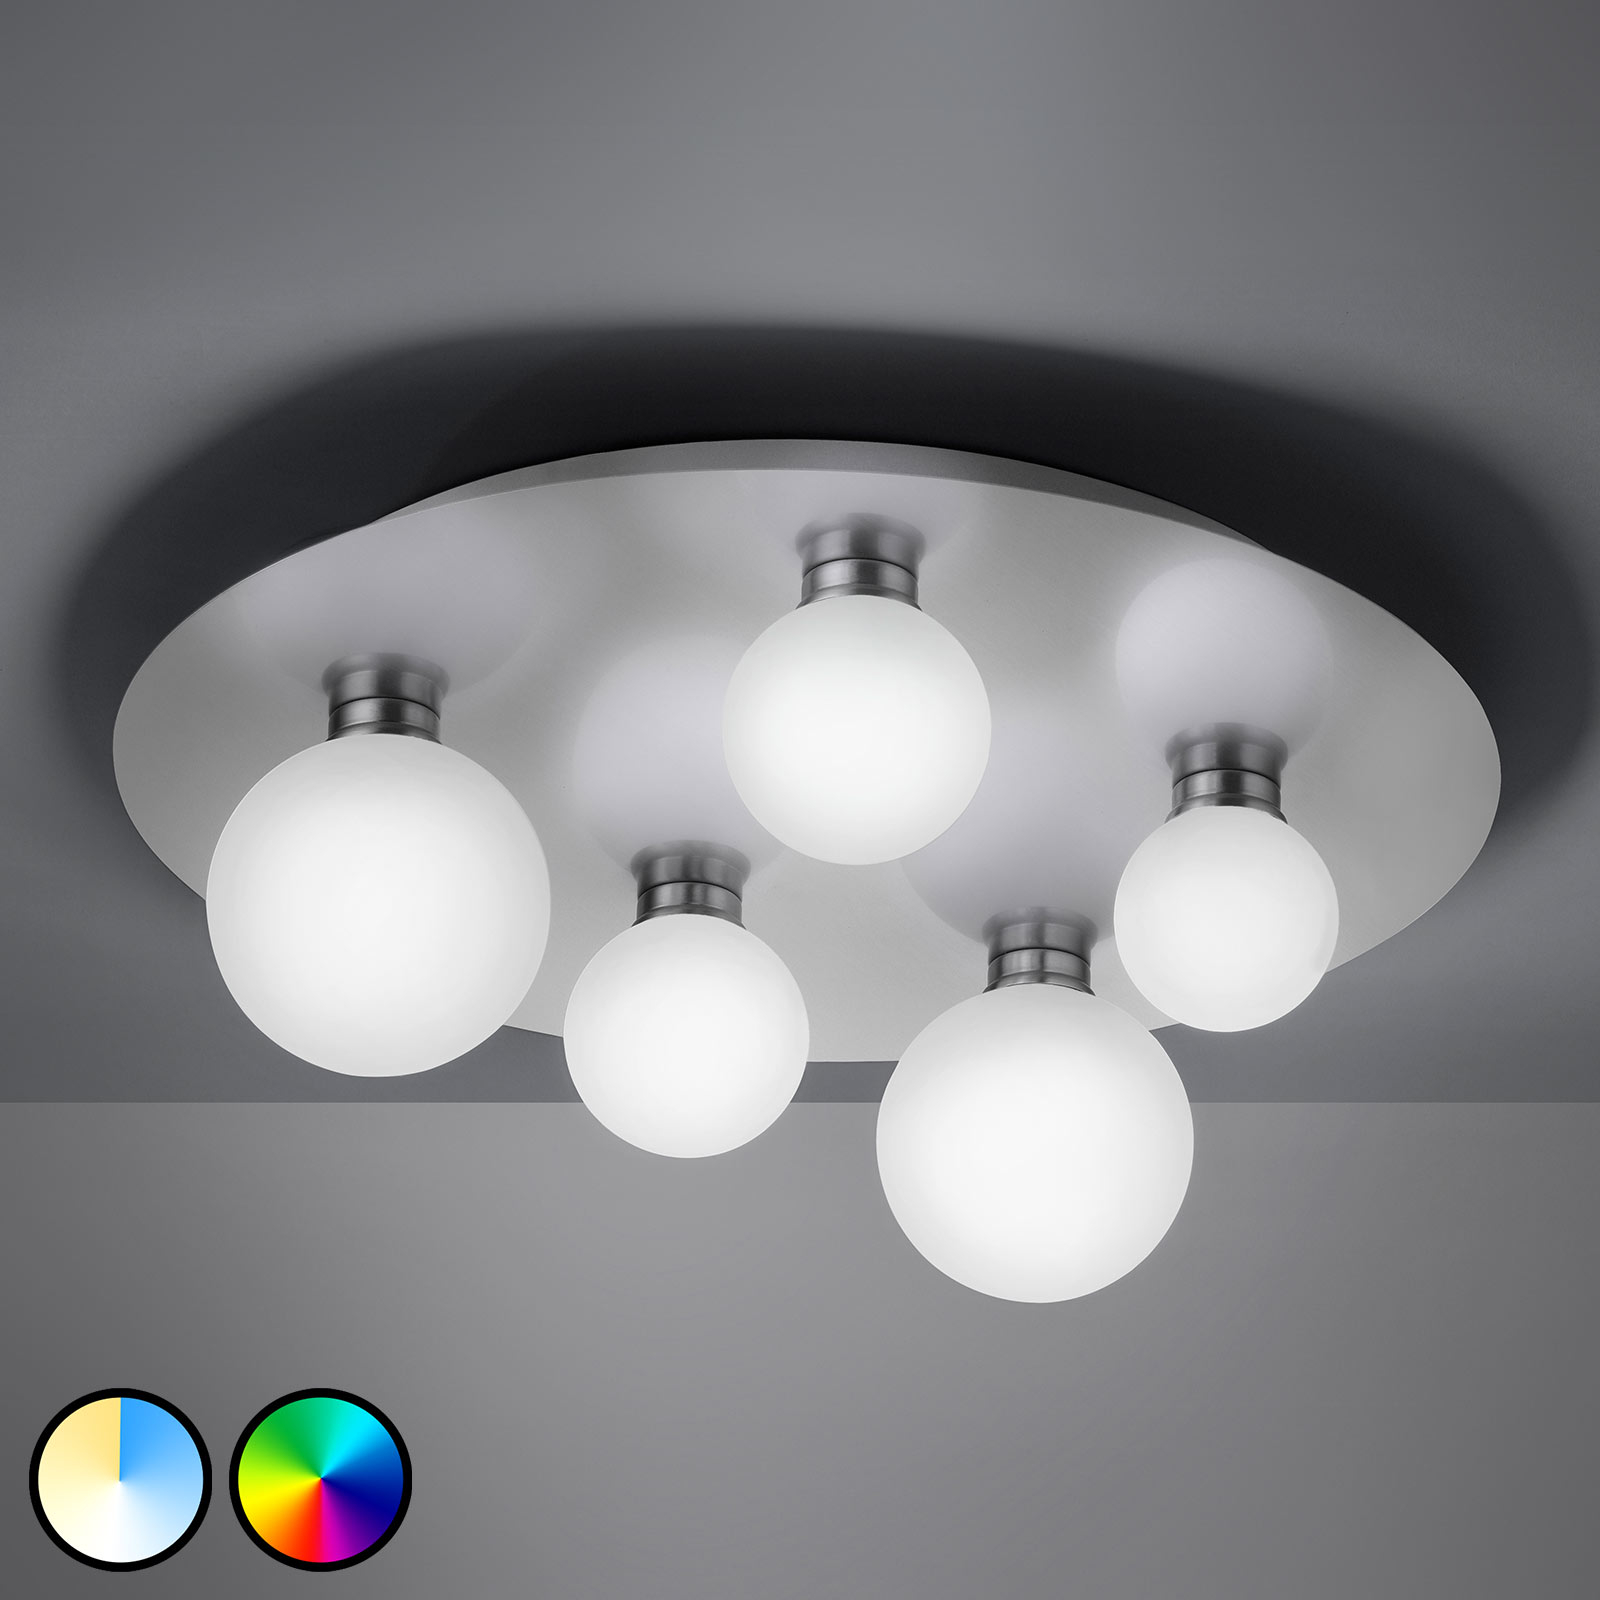 Trio WiZ Dicapio LED-taklampe, 5 lyskilder